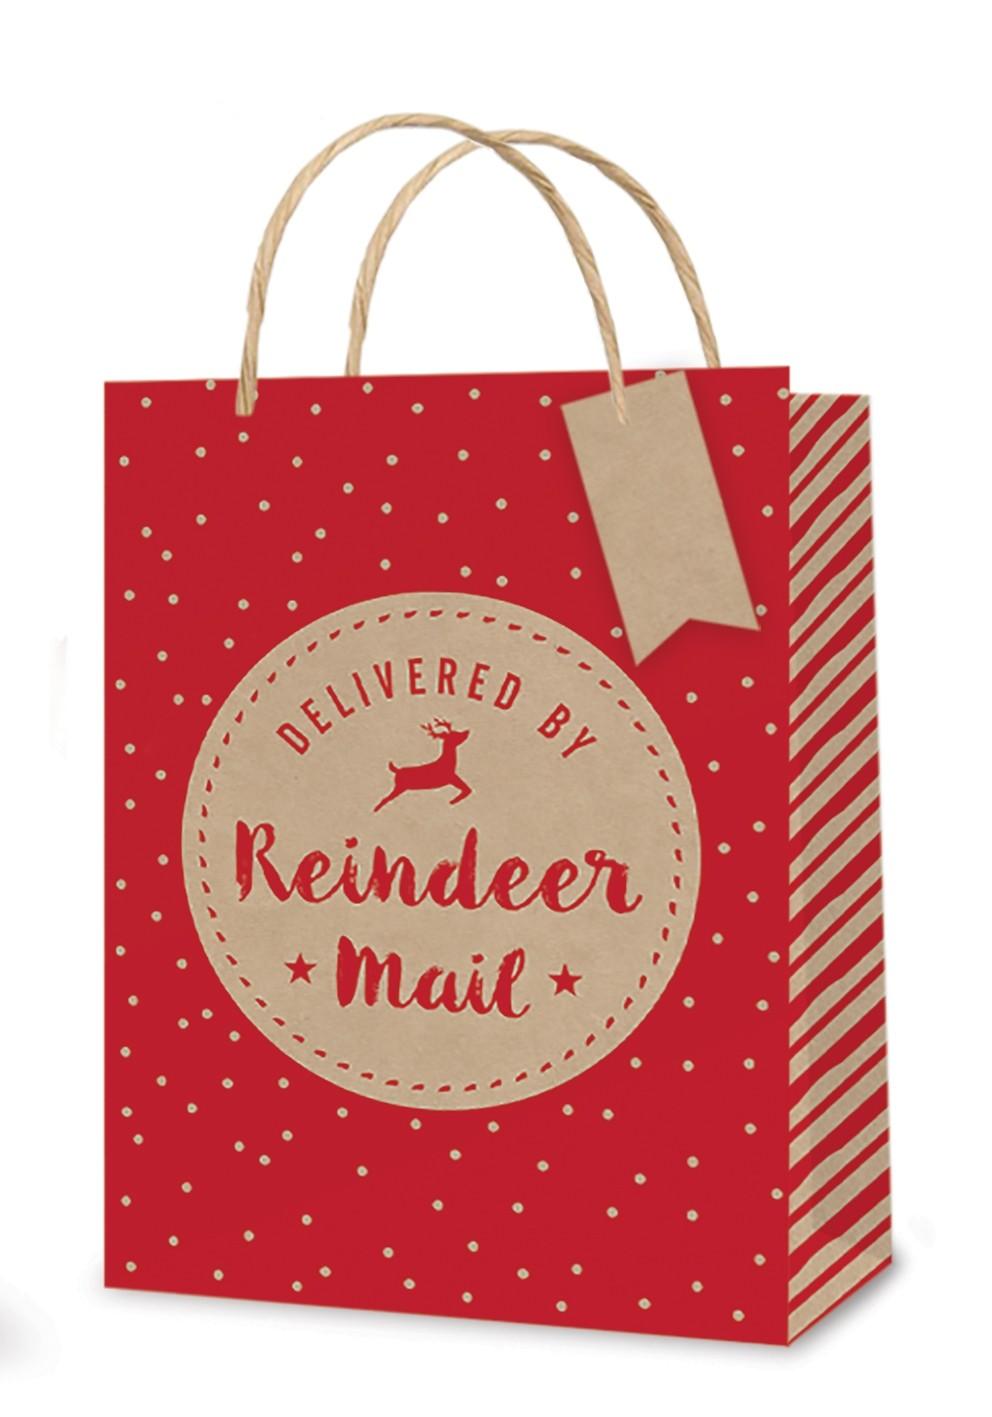 Kraft reindeer mail small gift bag